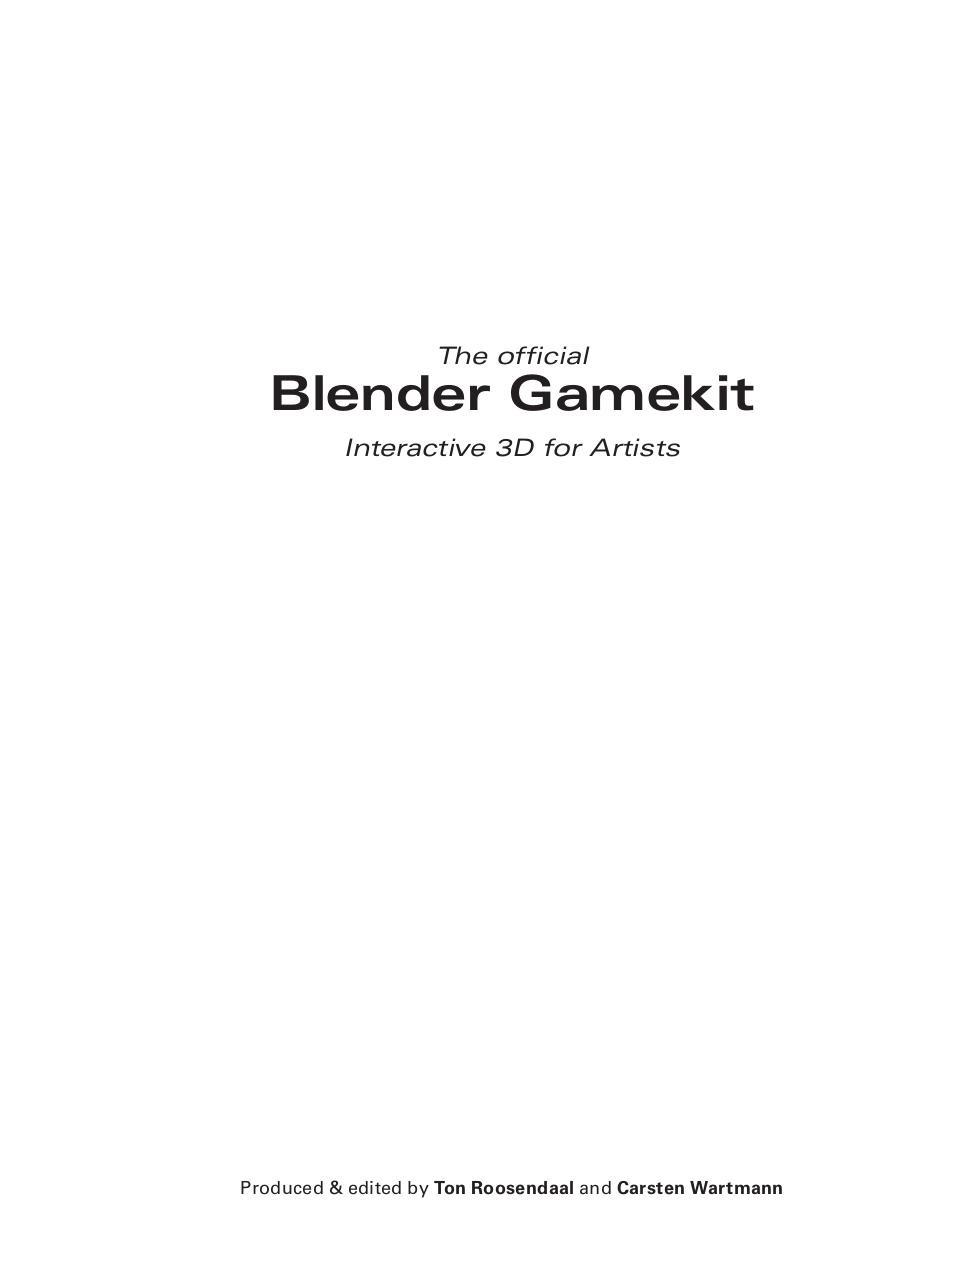 gamekit - Fichier PDF